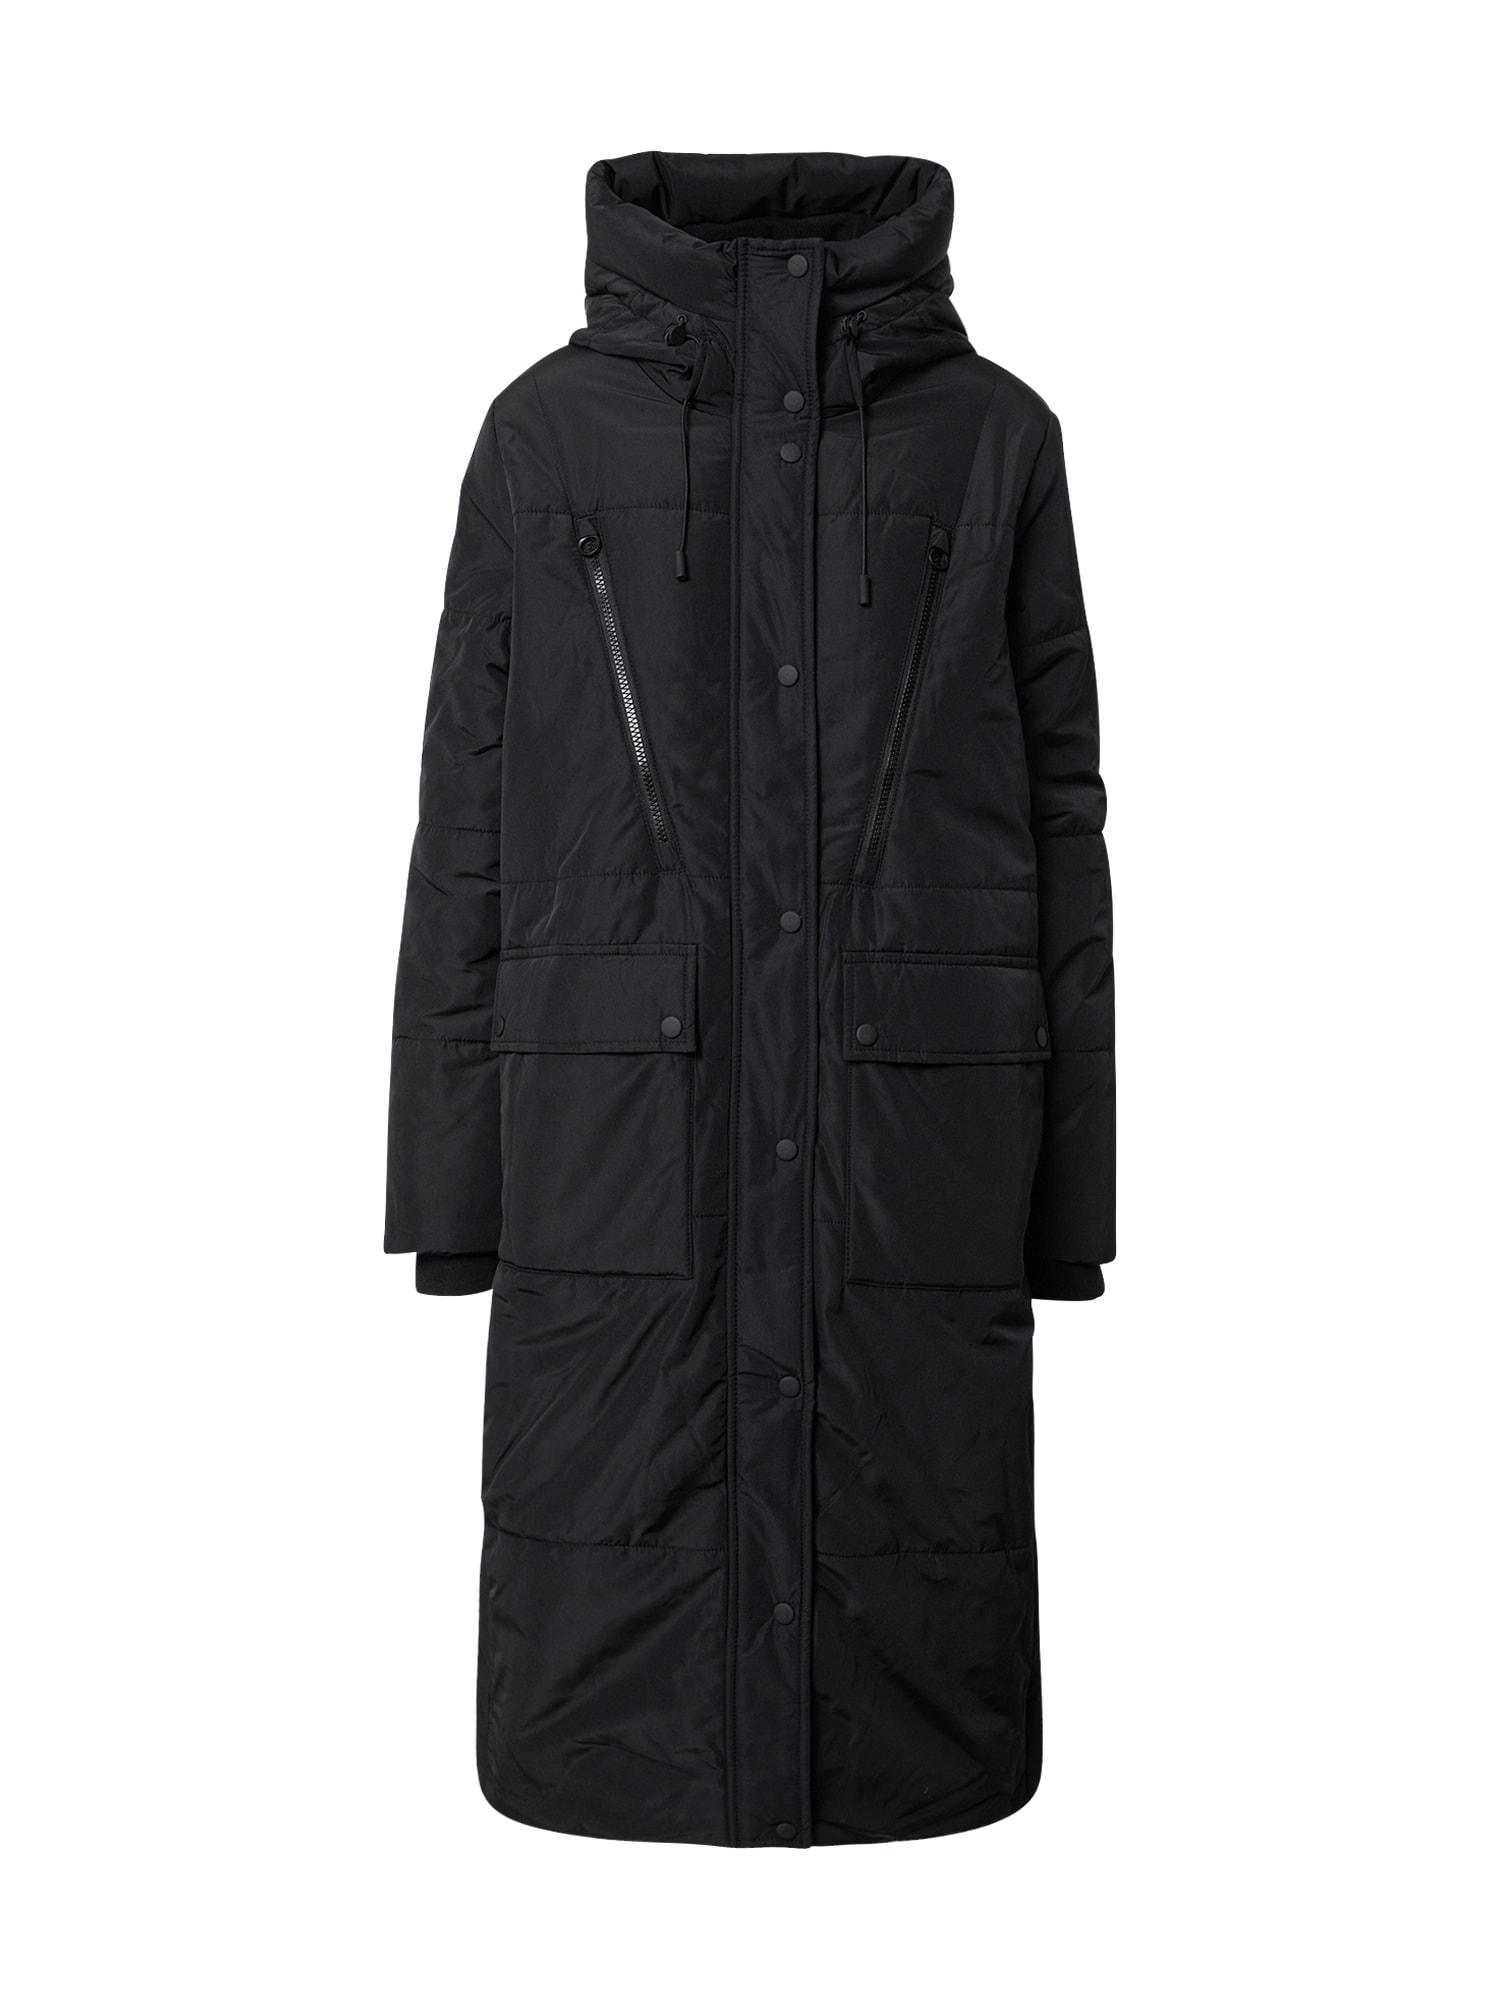 TOM TAILOR DENIM Zimní kabát  černá